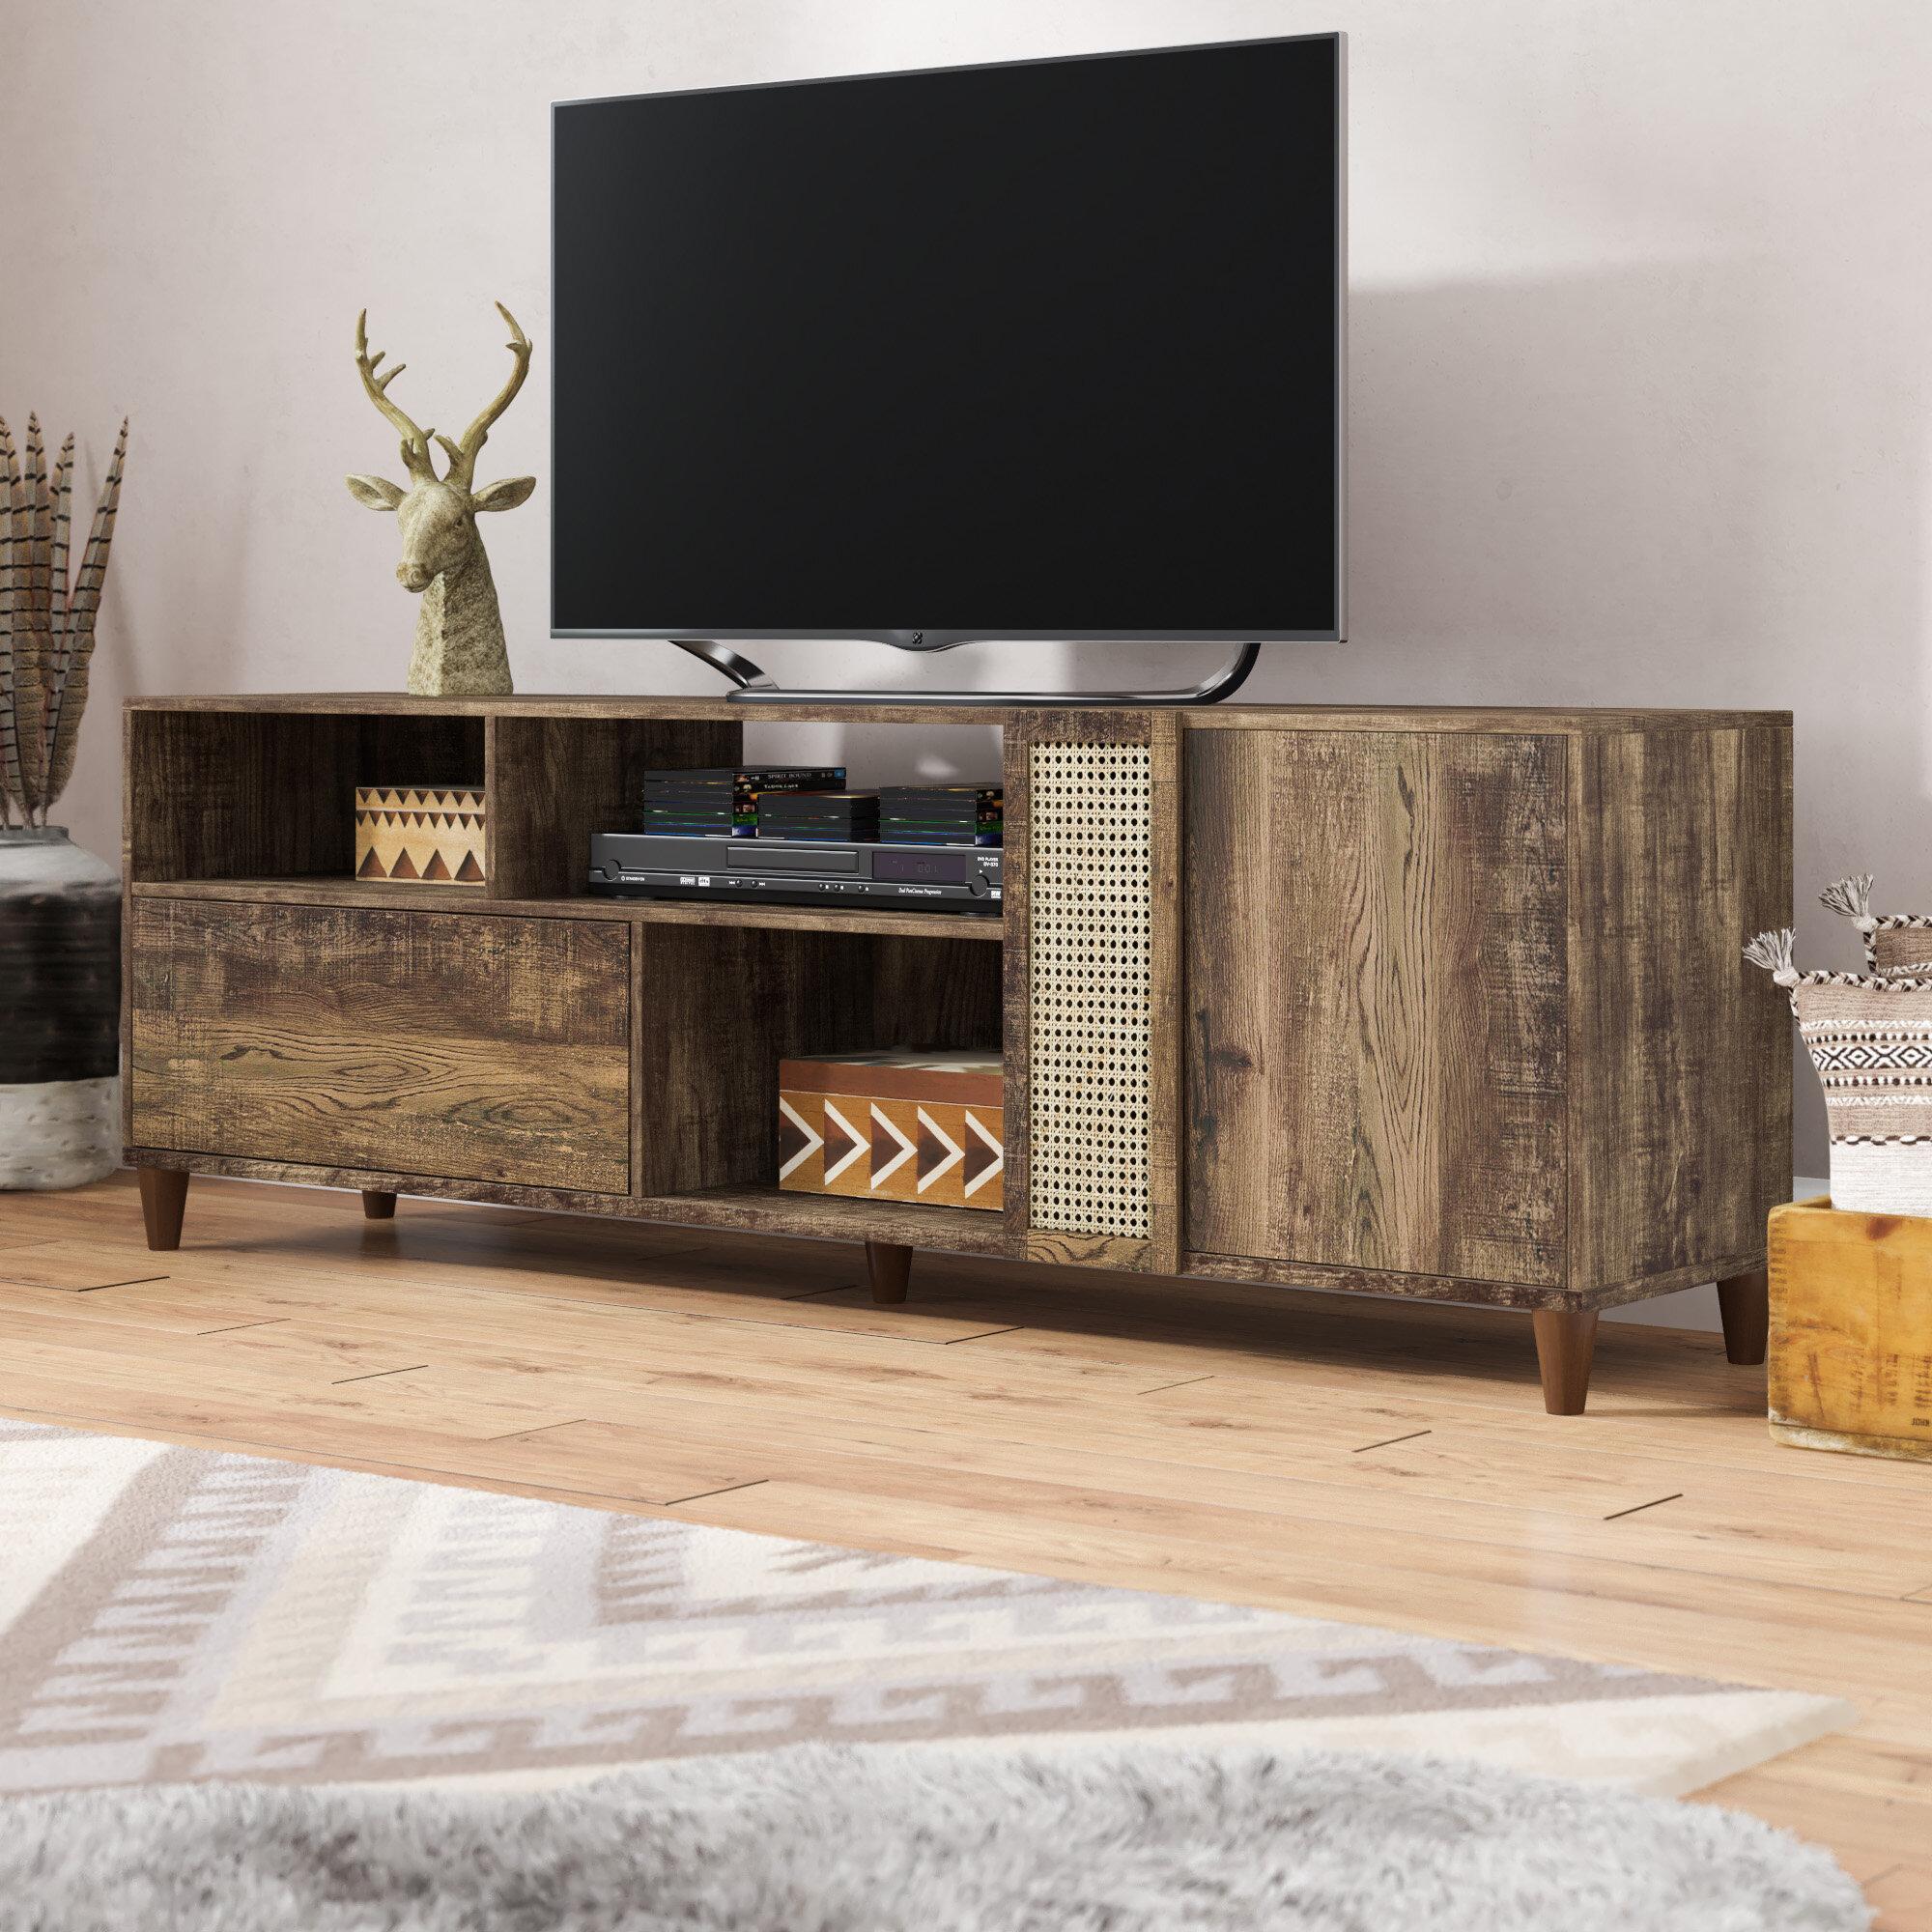 Mistana Ari Tv Stand For Tvs Up To 80